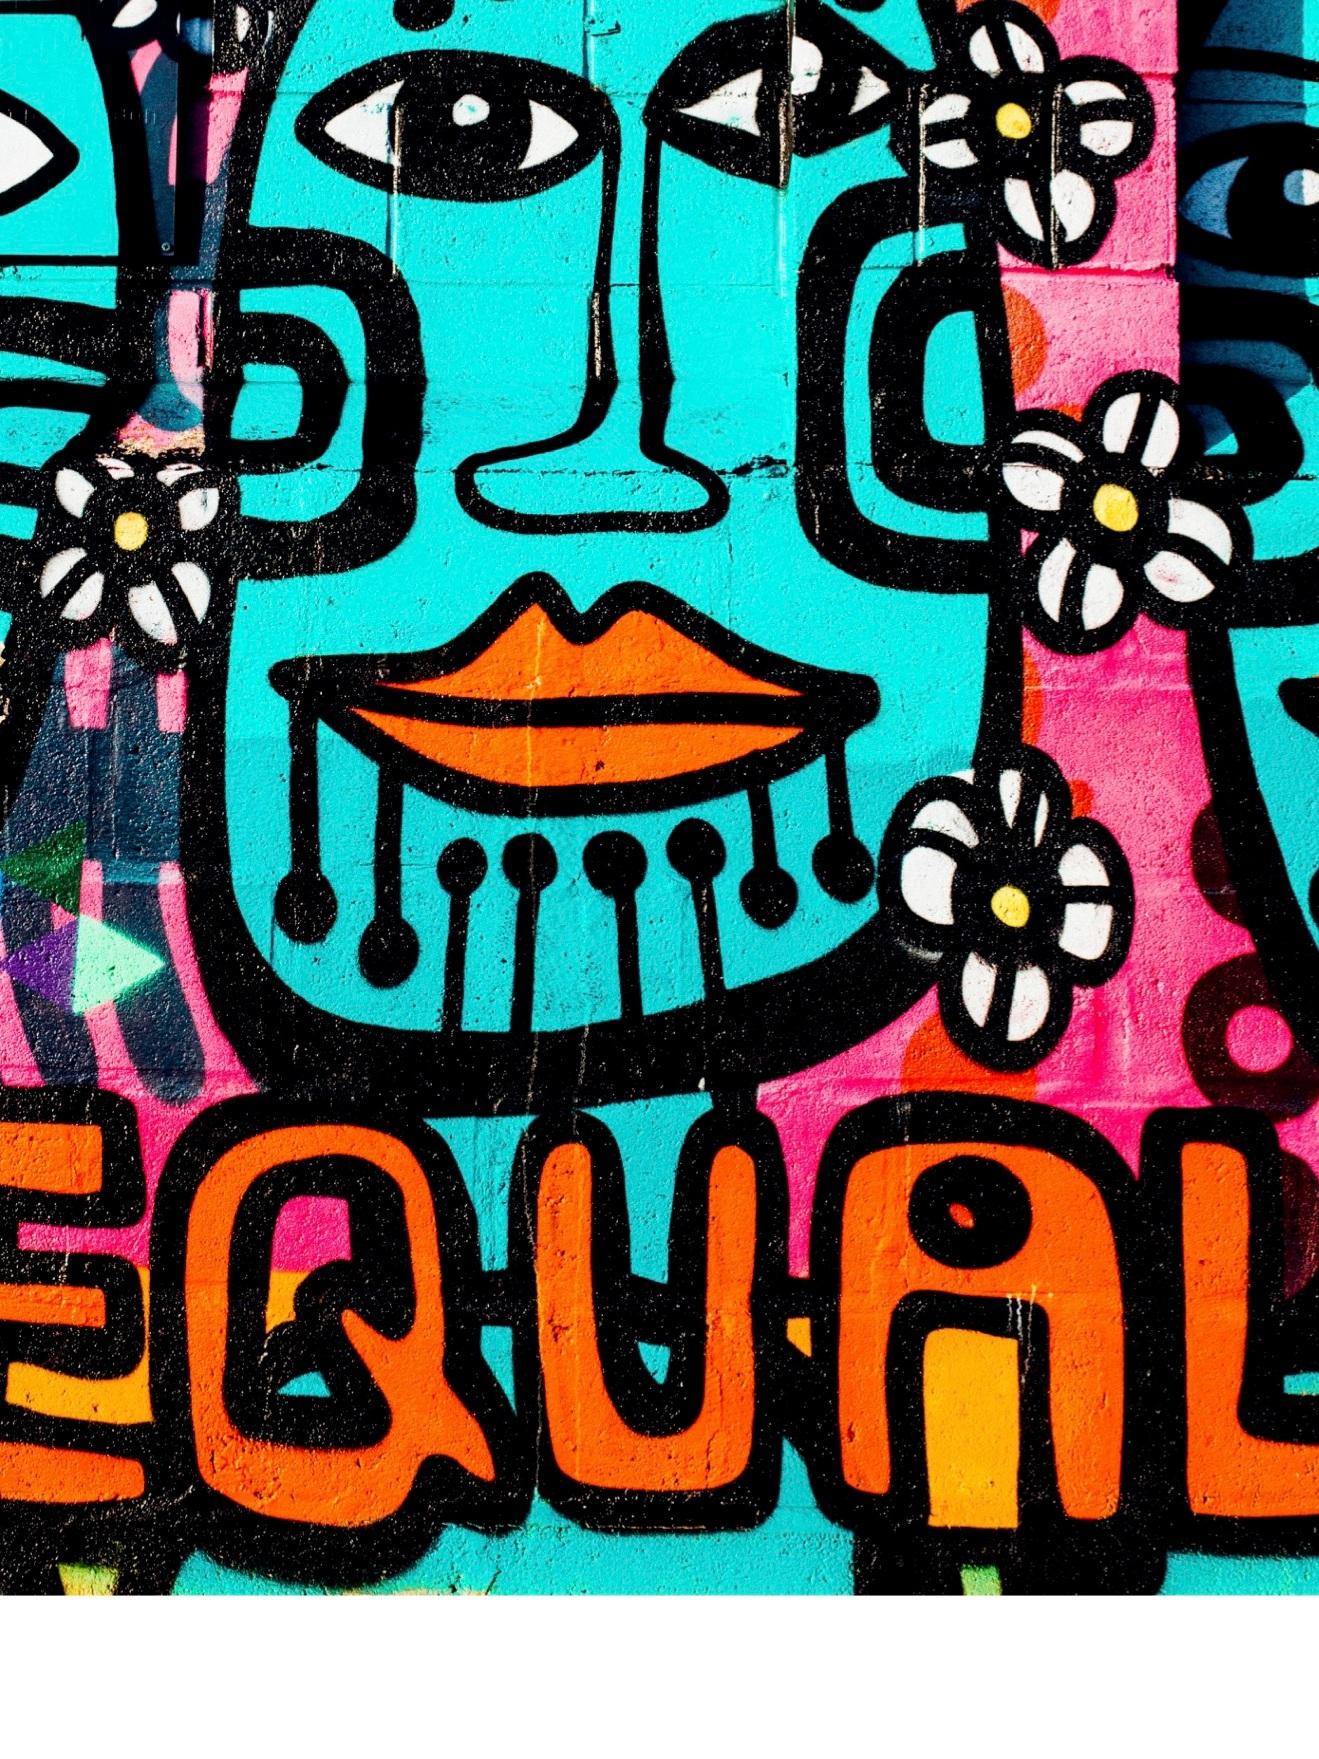 The Inclusion Handbook - By Vaishnavi Tekumalla, Chryslynn D'Costa and Ishani Roy